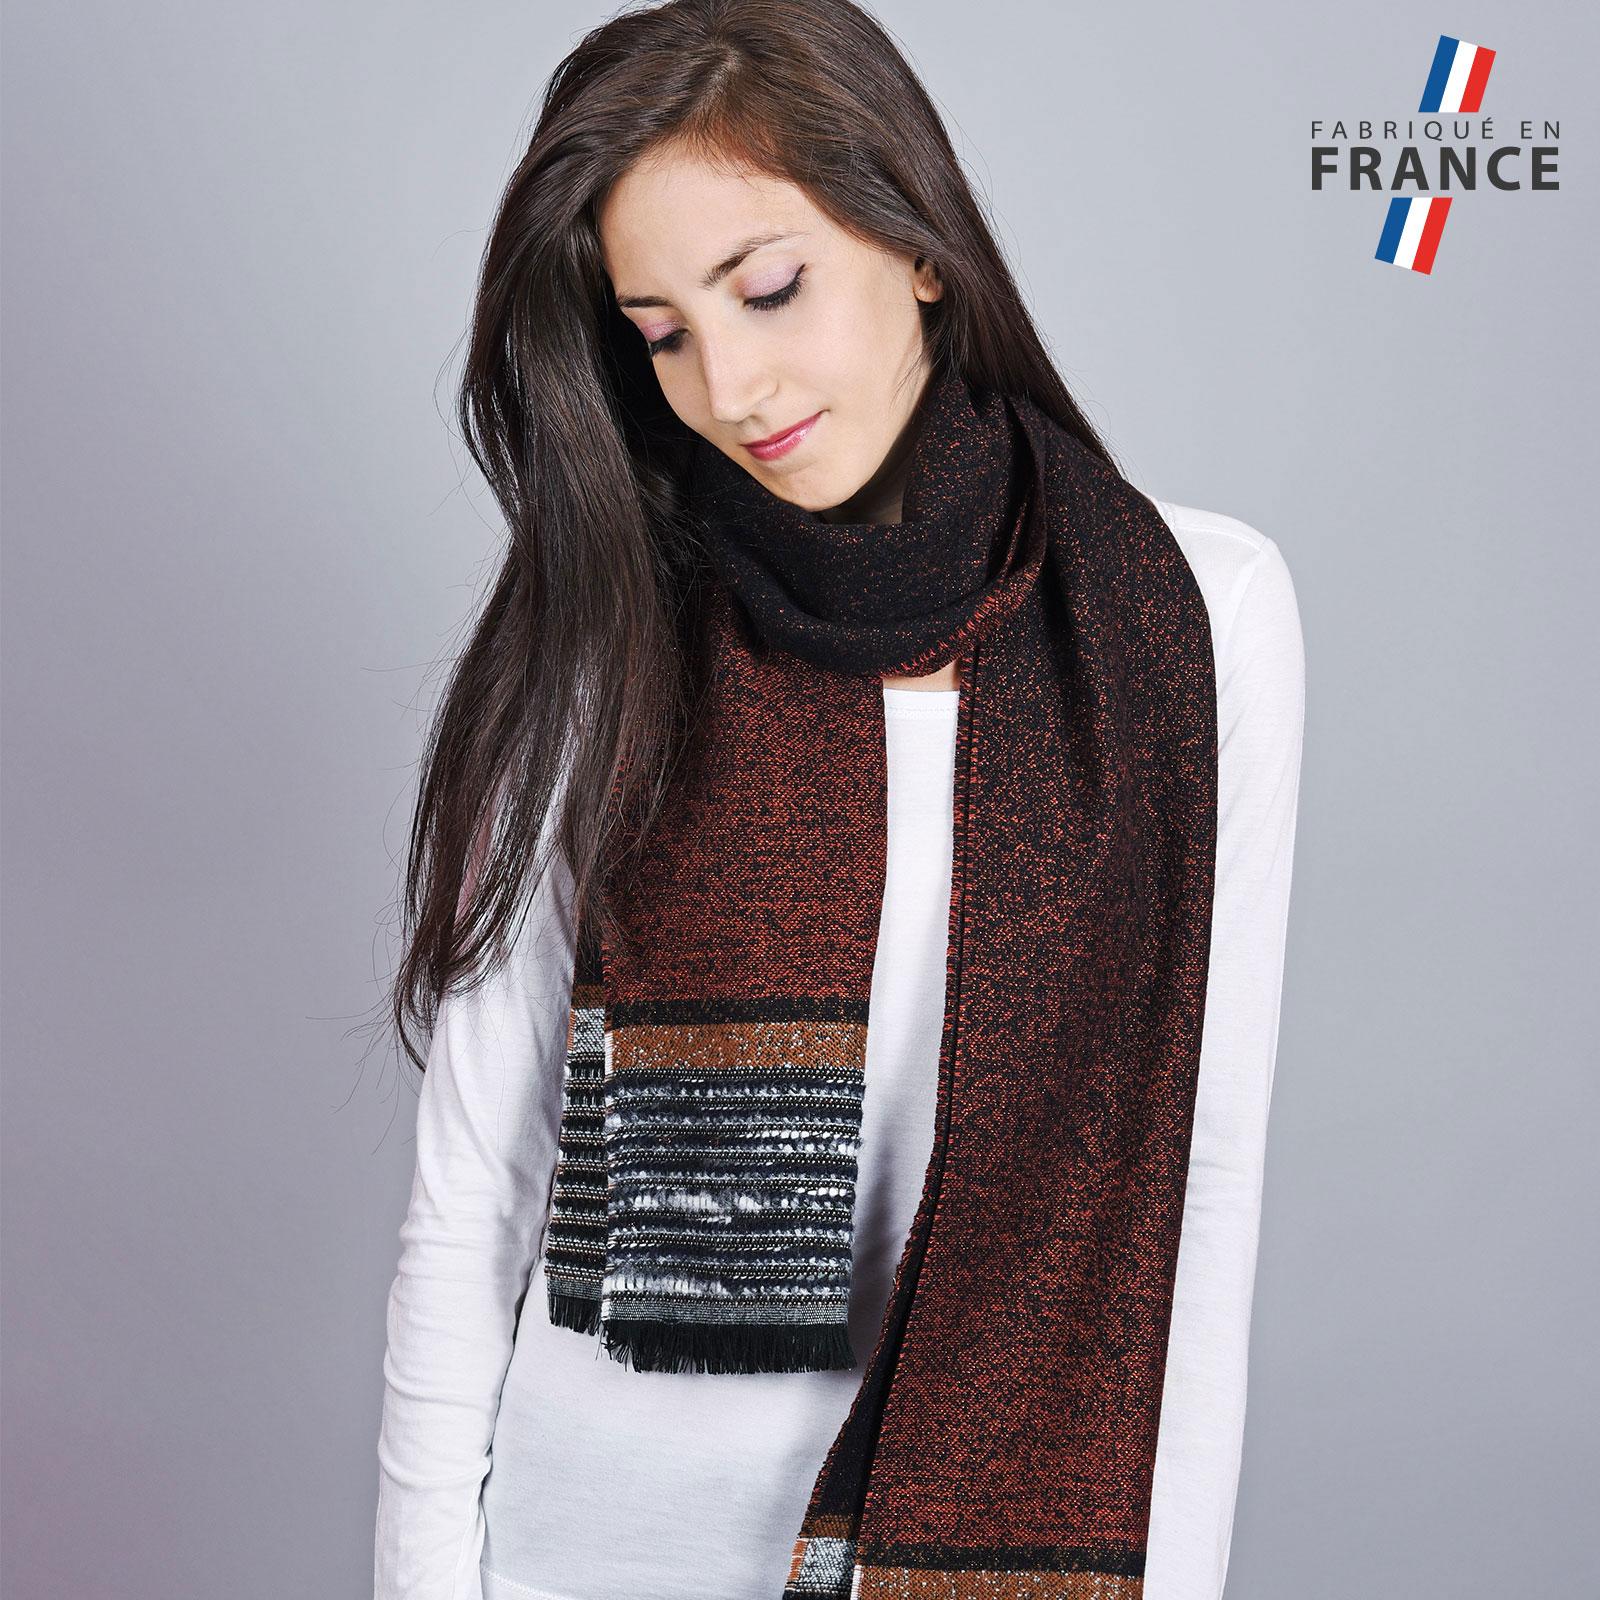 AT-04539-VF16-1-LB_FR-echarpe-femme-marron-noire